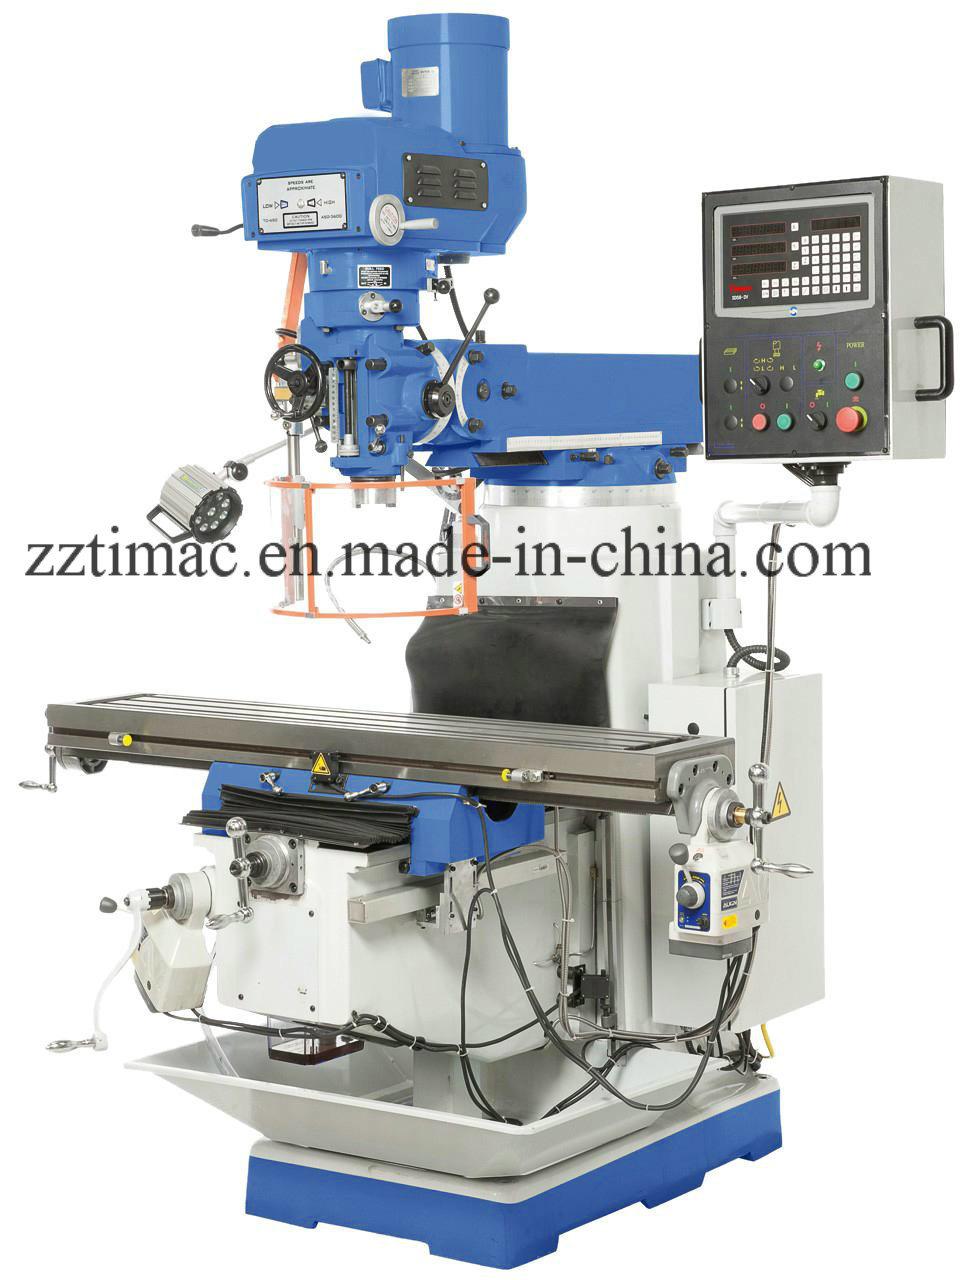 Vertical Turret Milling Machine (4sf/4vf, 4s/4V, 5s/5V)